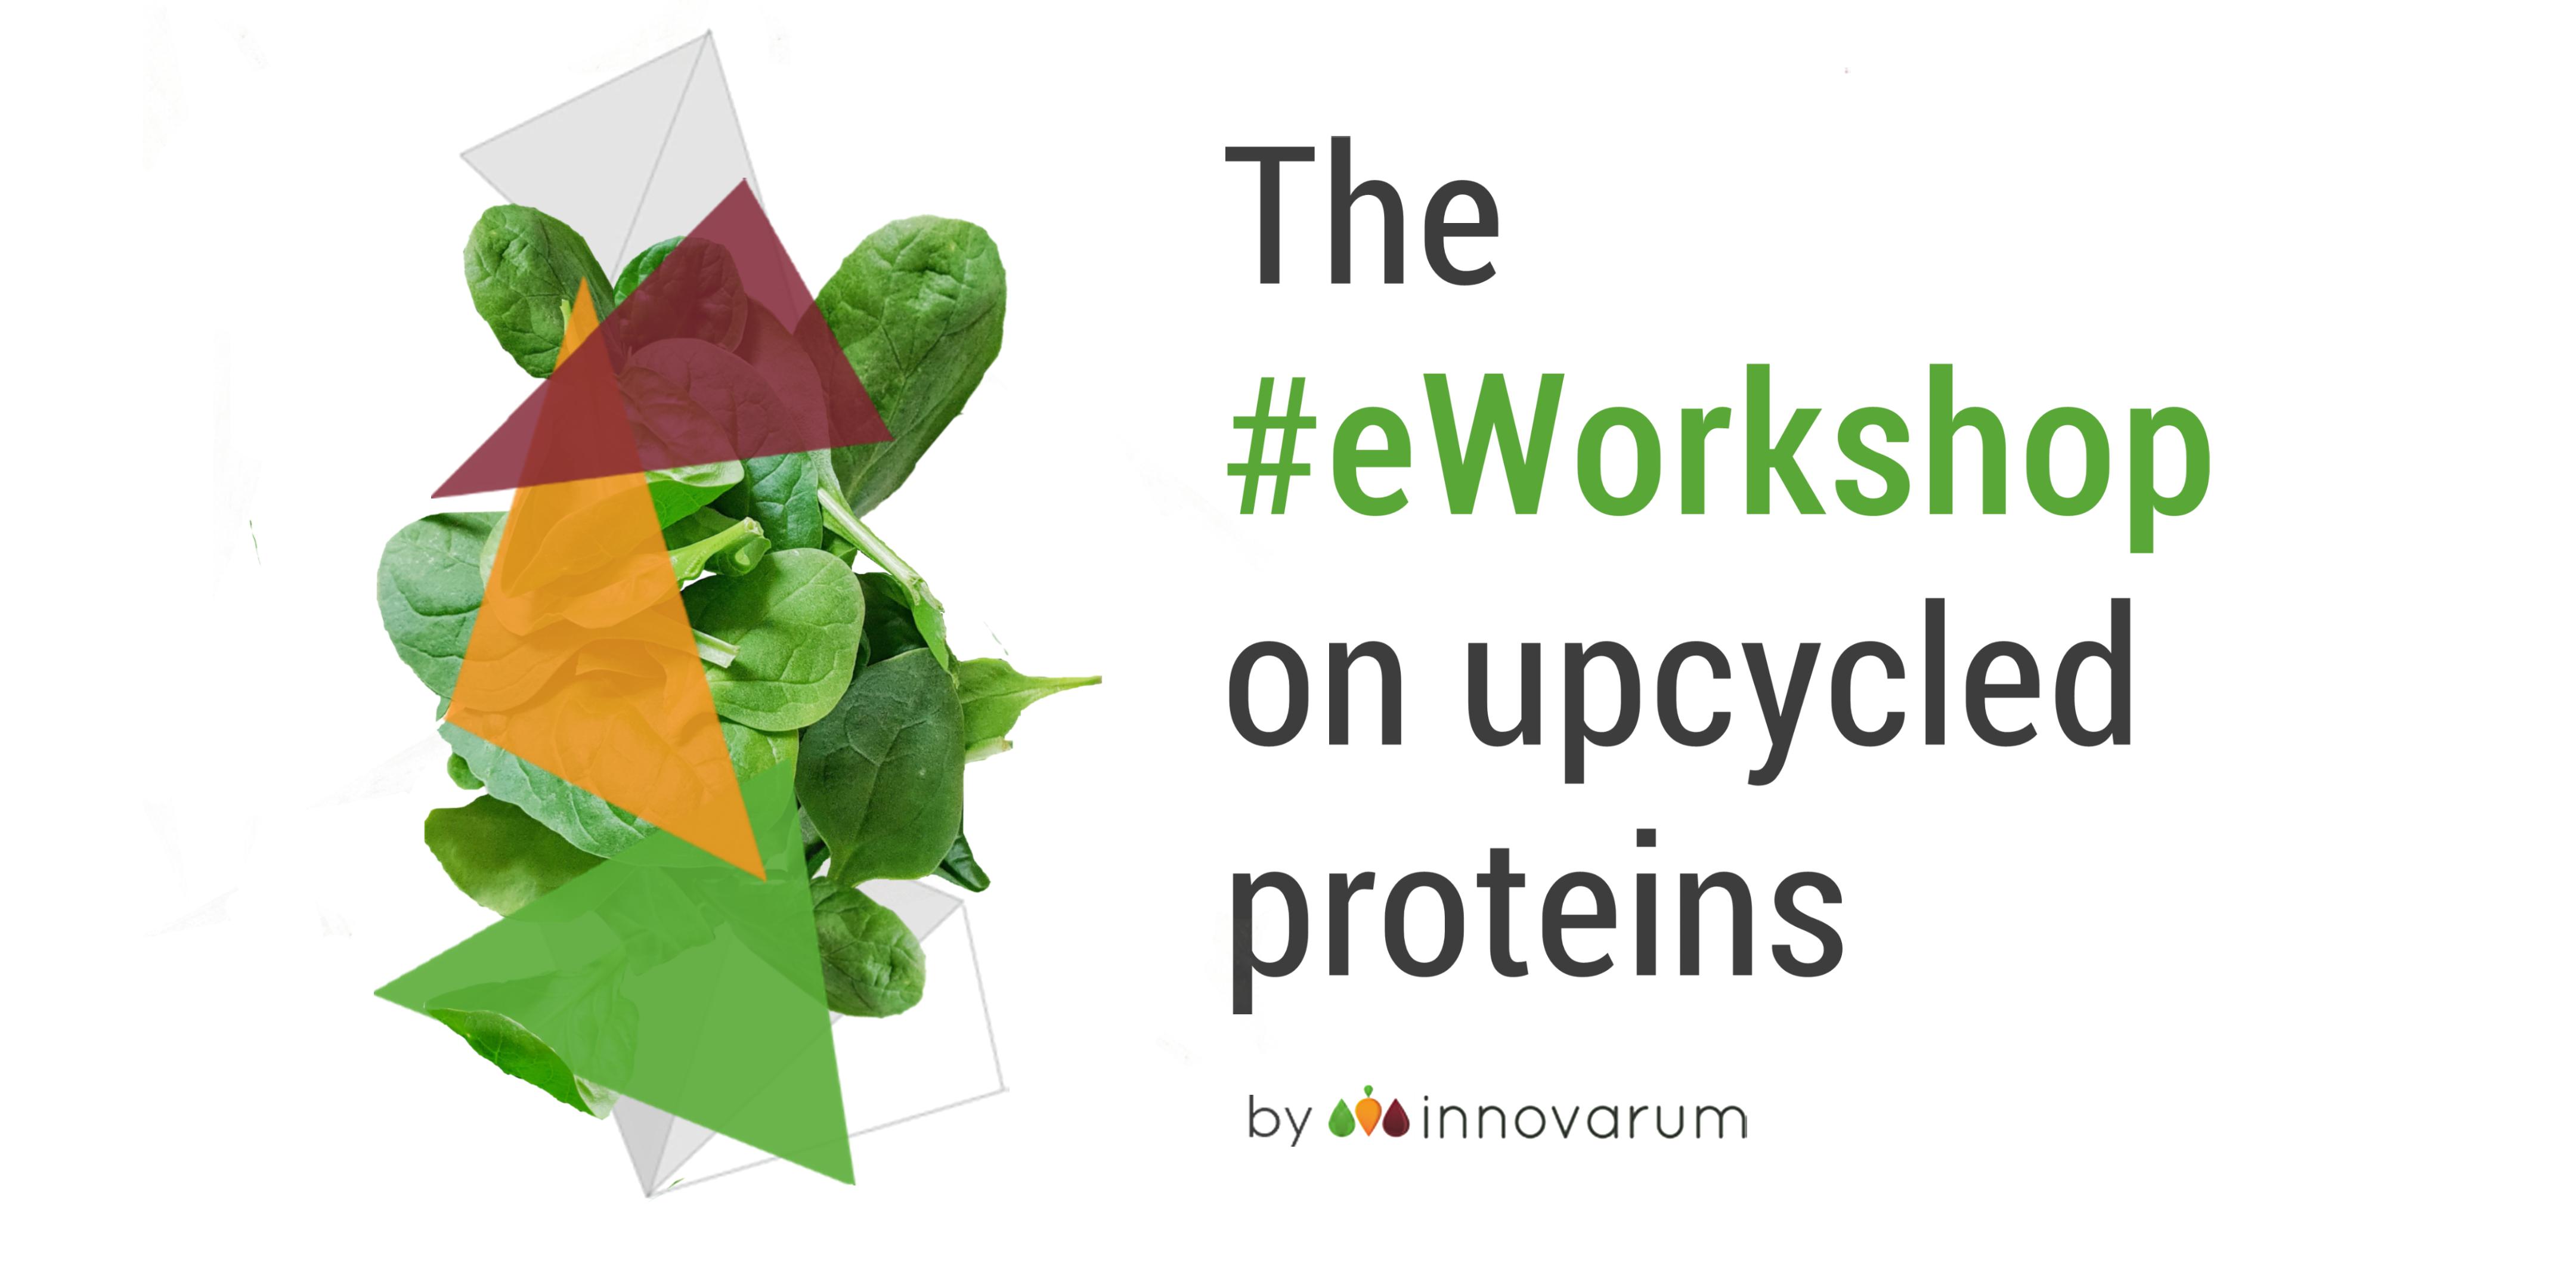 Valuewaste eworkshop upcycled proteins